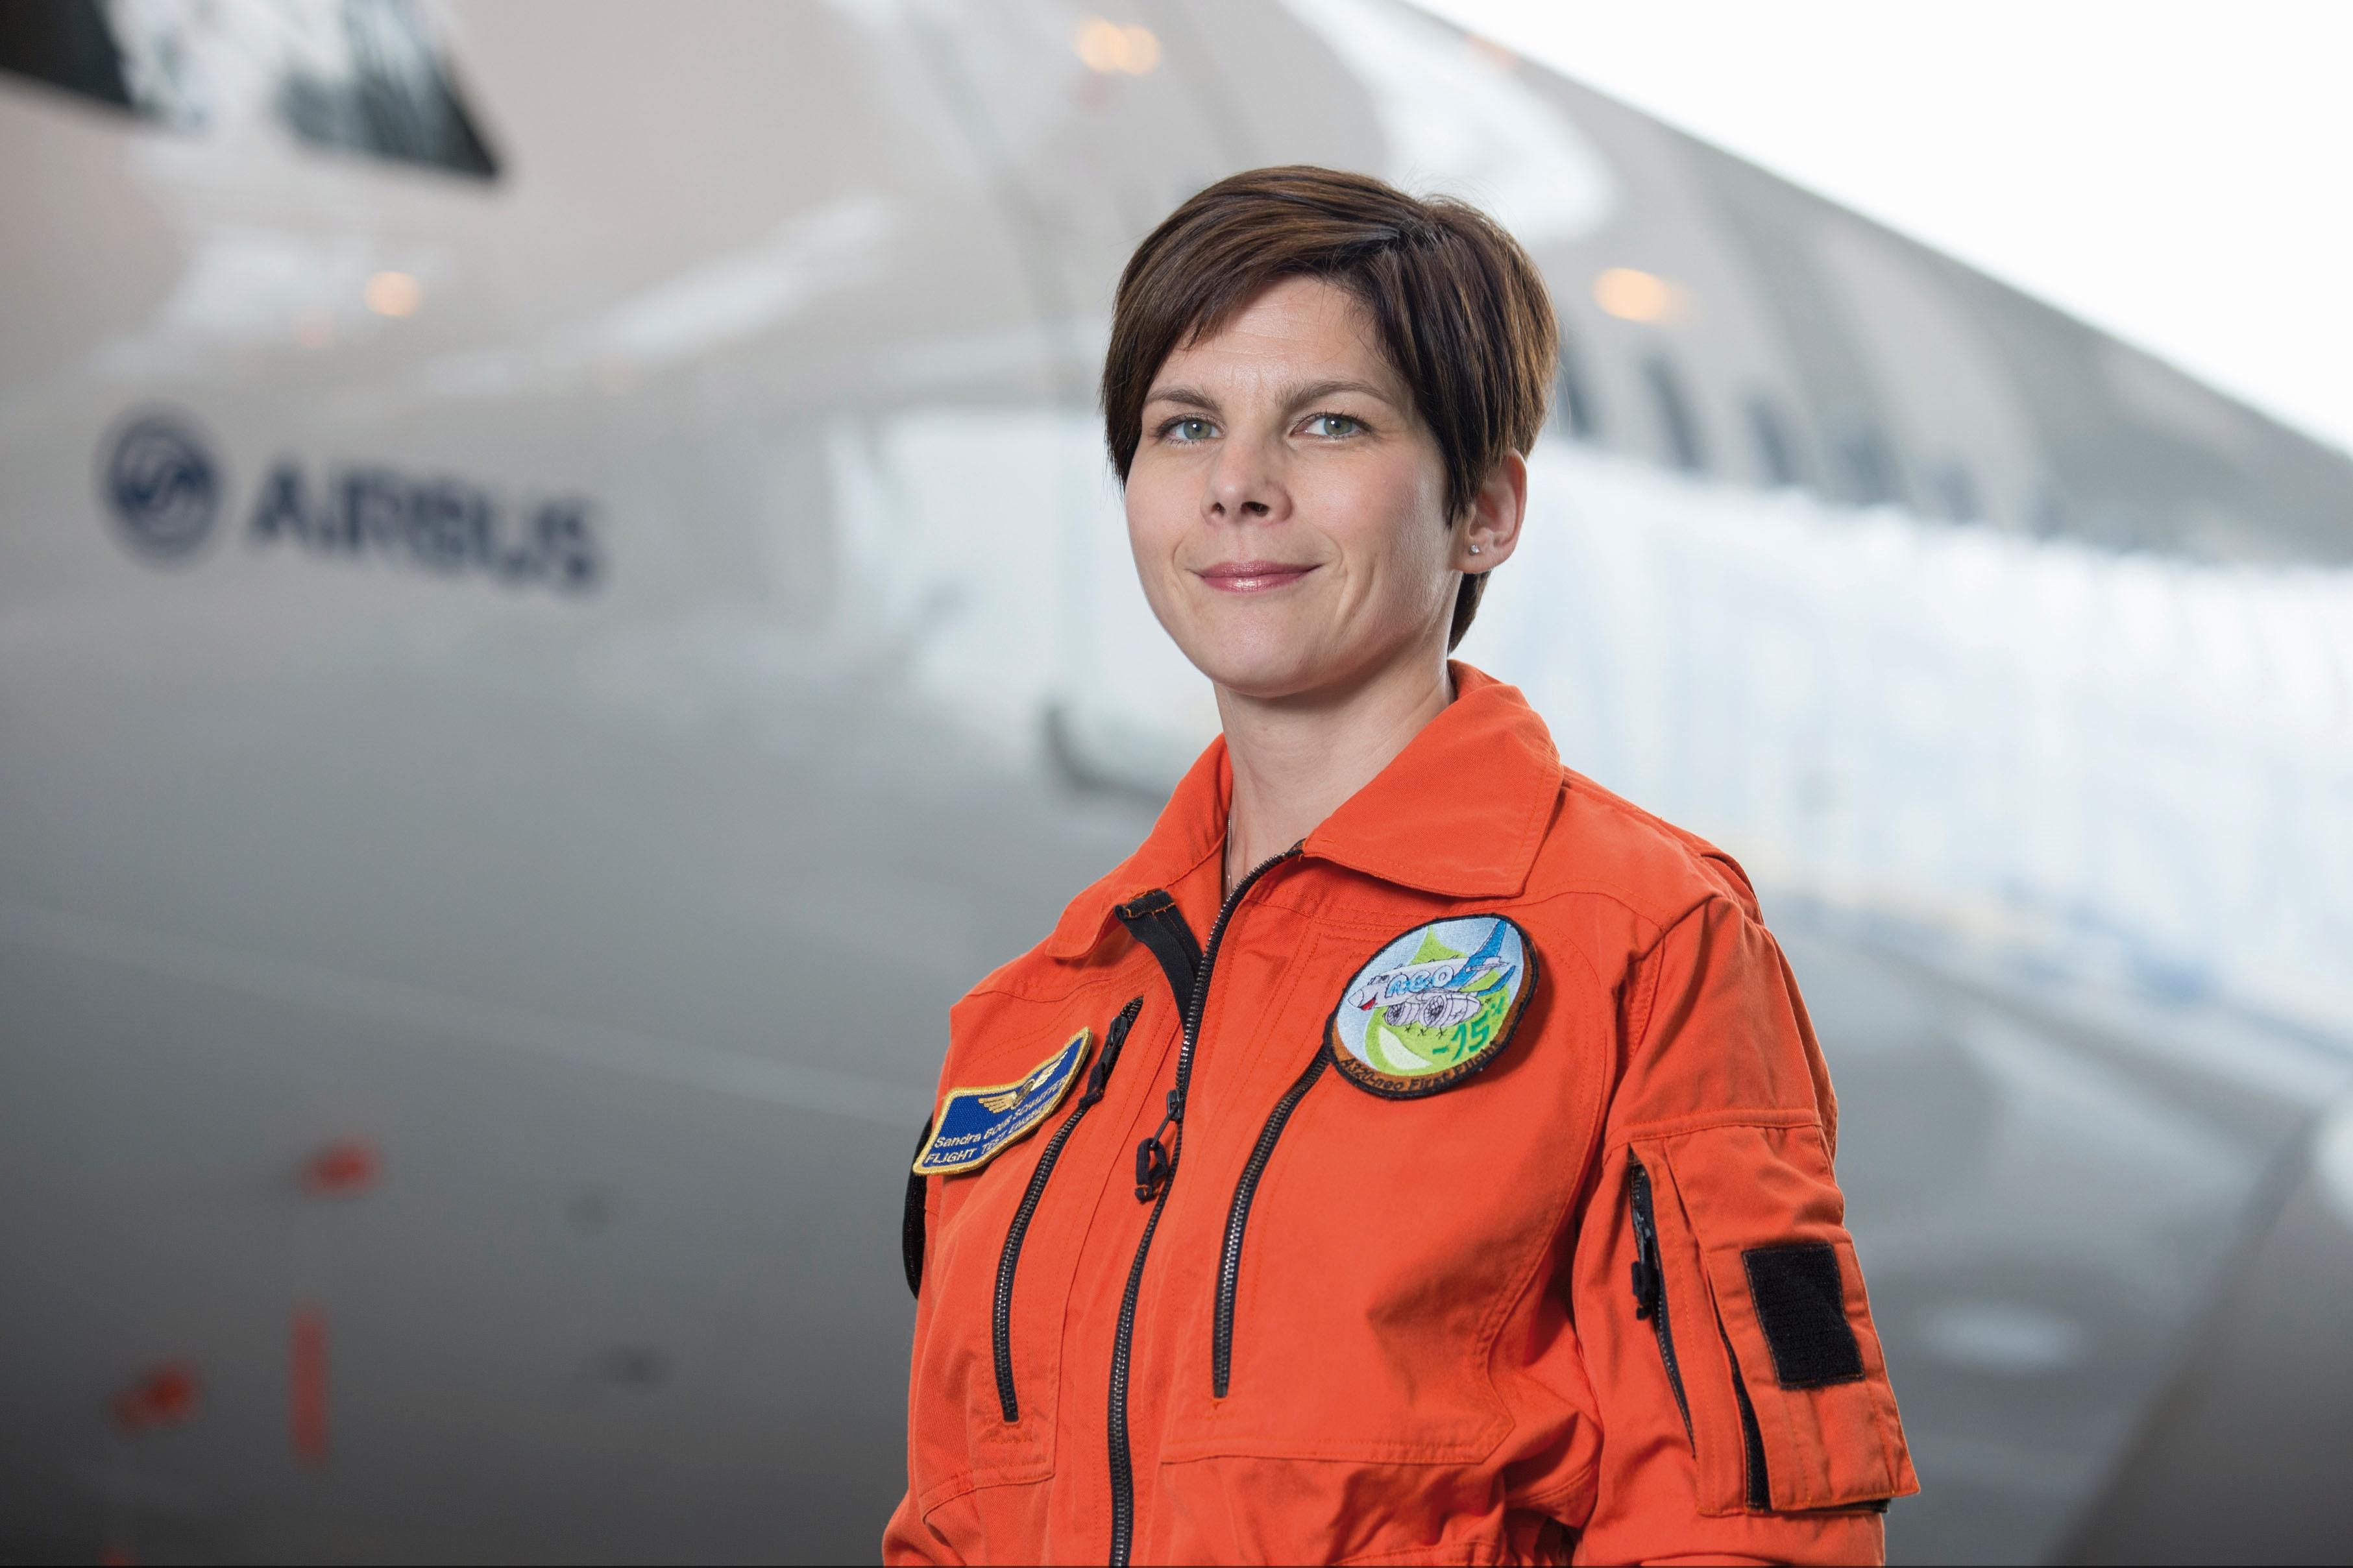 Dr Sandra Bour Schaeffer